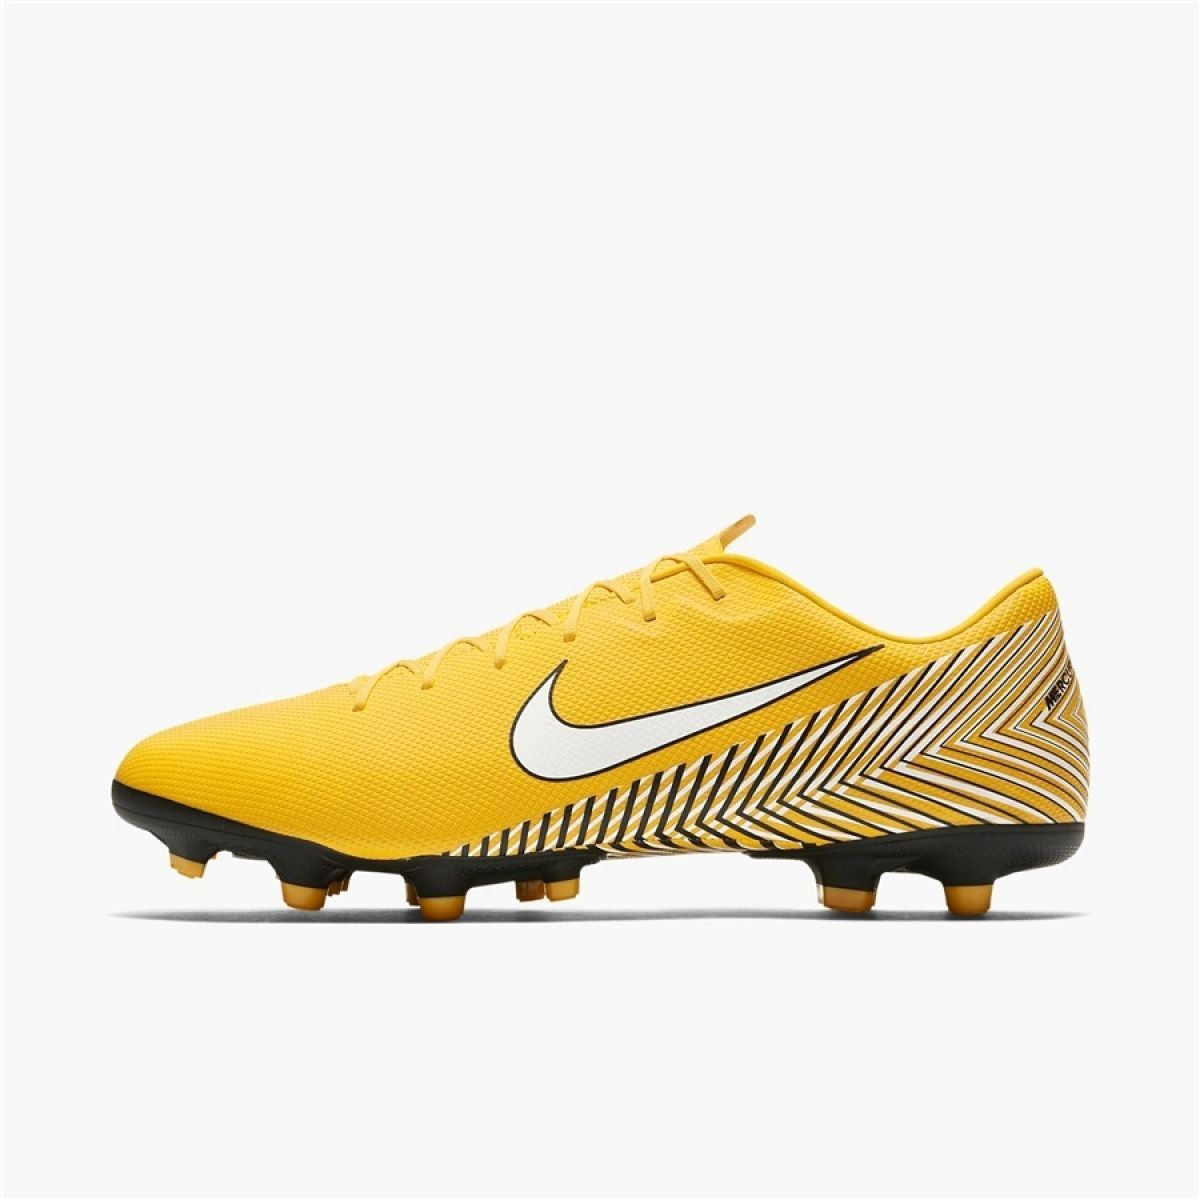 Nike soccer shoes, Football shoes